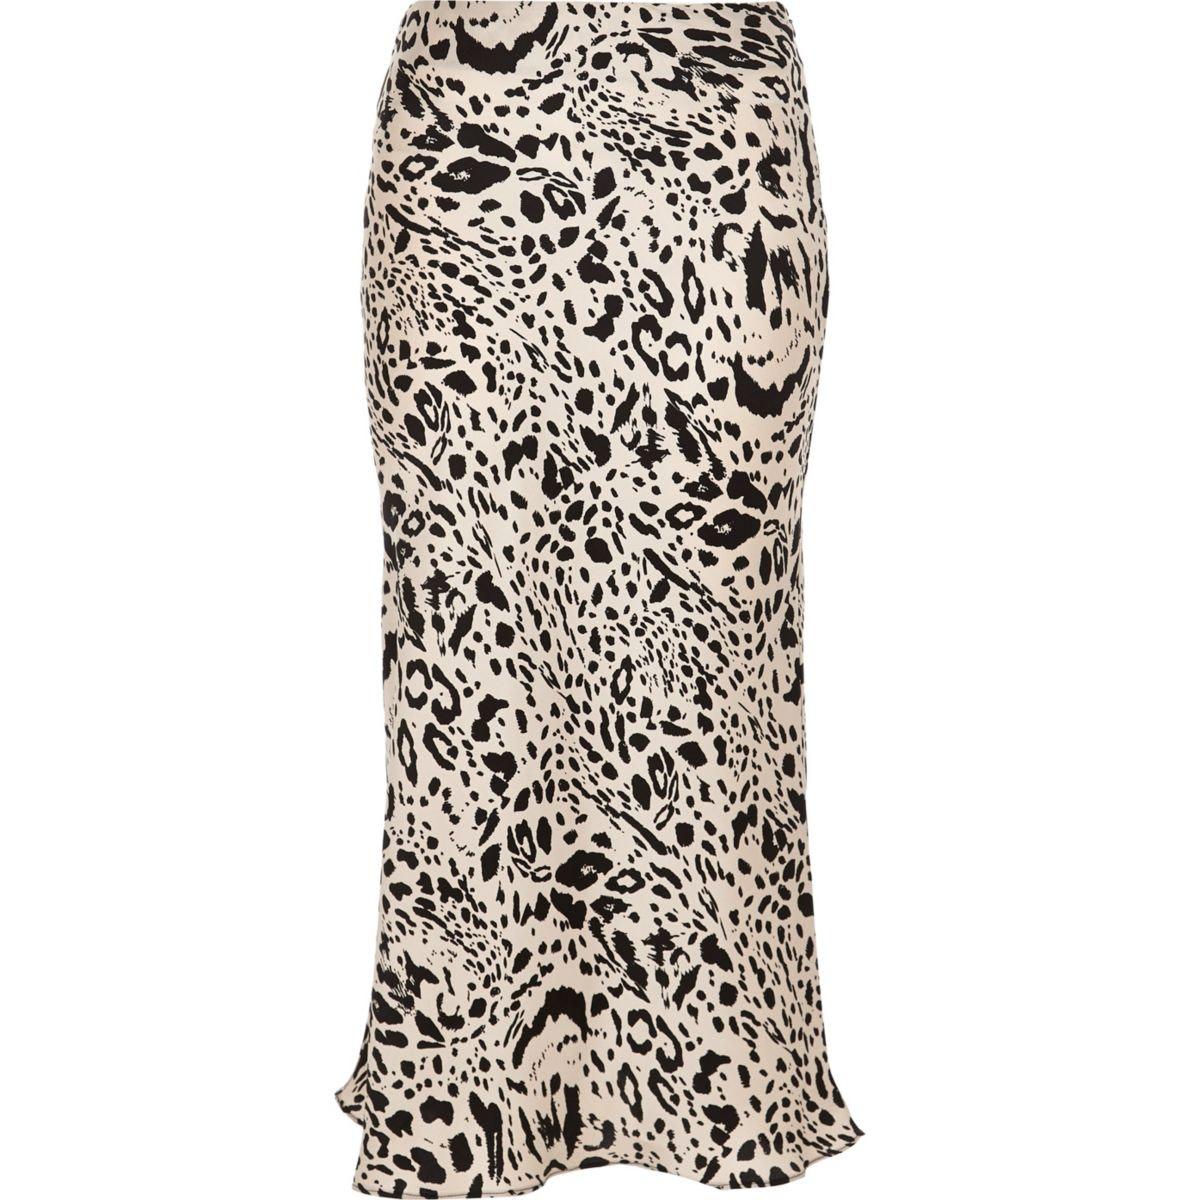 Black leopard print satin midi skirt